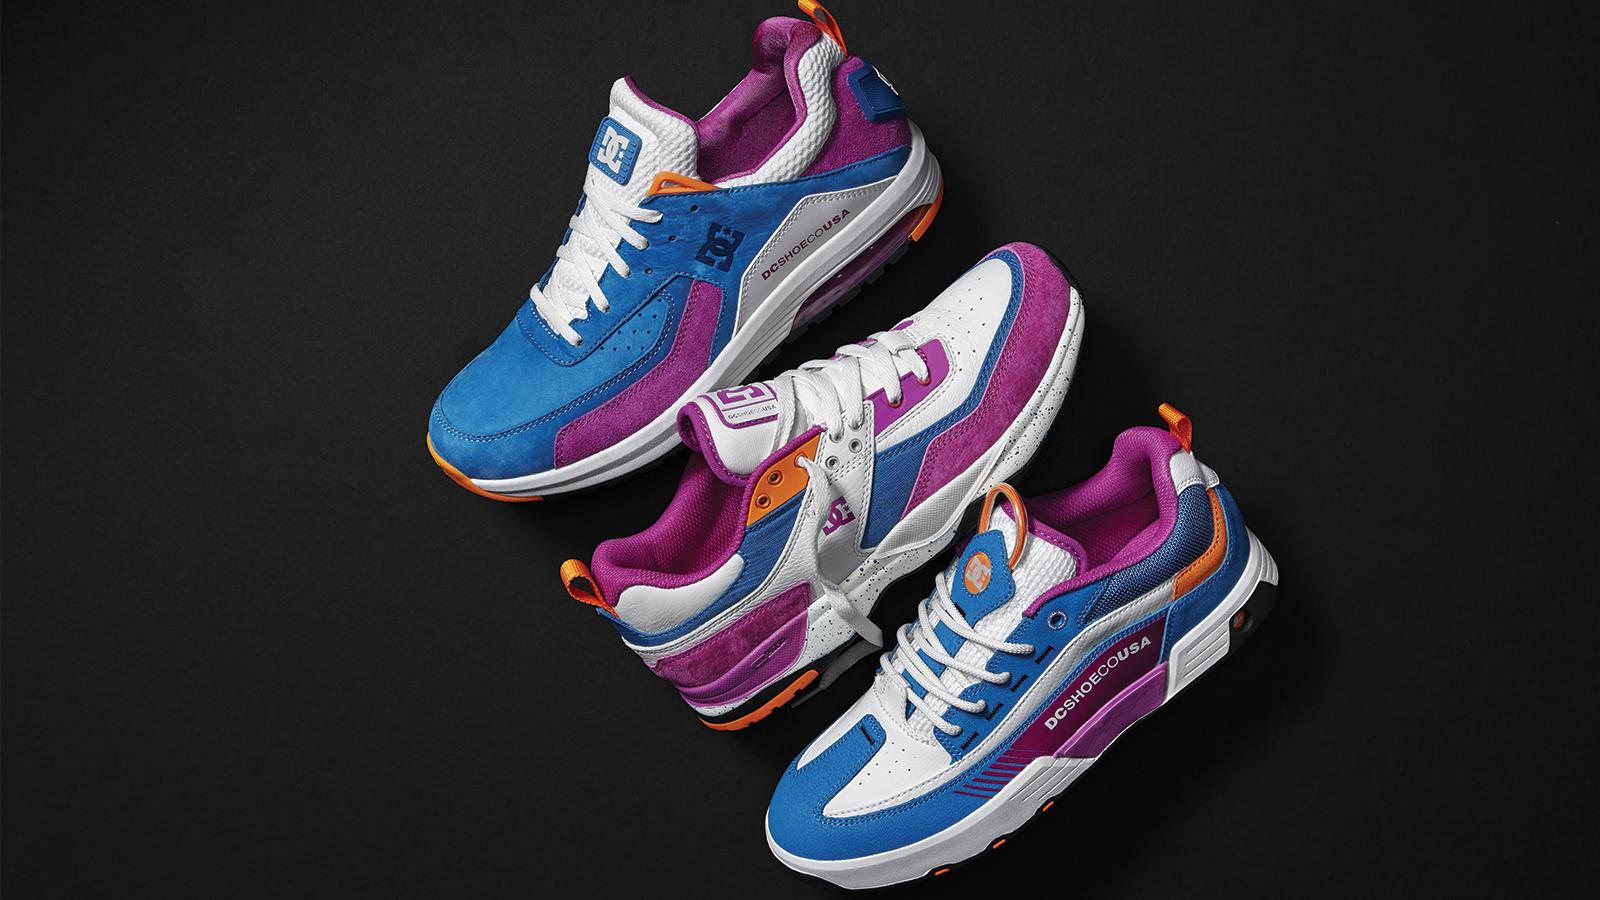 cheap for discount 0c2b3 635e1 DC Shoes SS19 Skateboard Footwear - Boardsport SOURCE